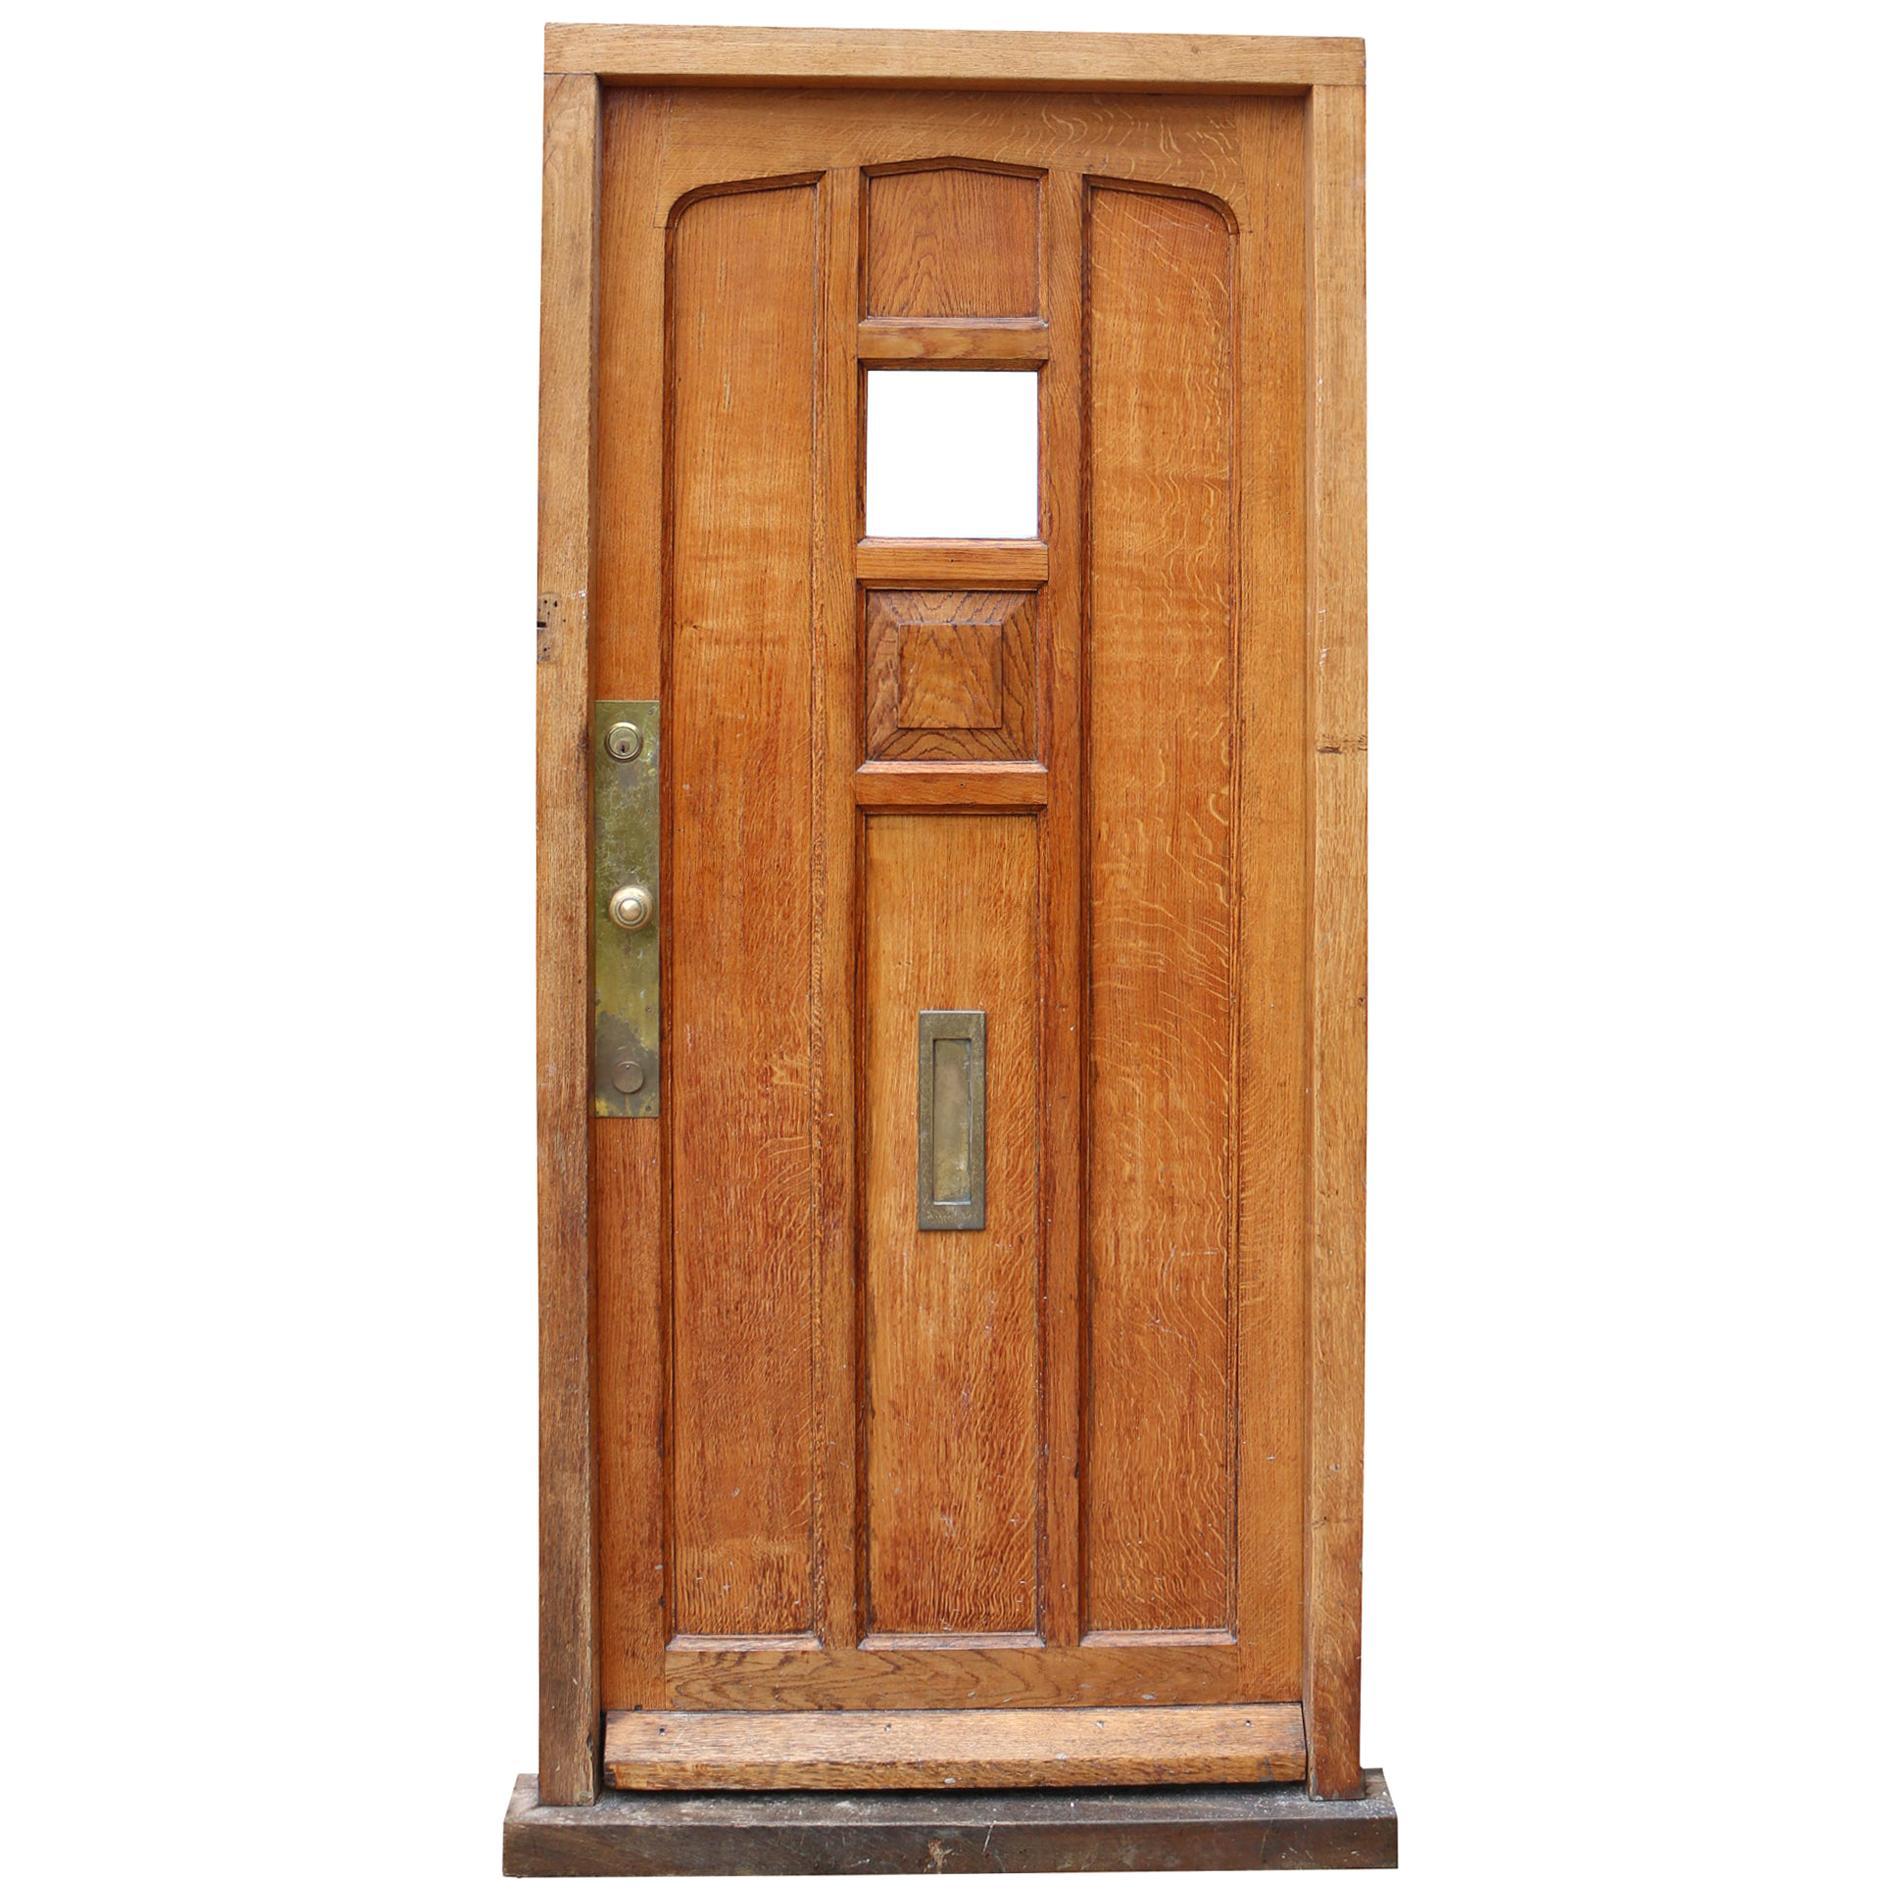 Superieur Antique Oak Exterior Or Front Door For Sale At 1stdibs